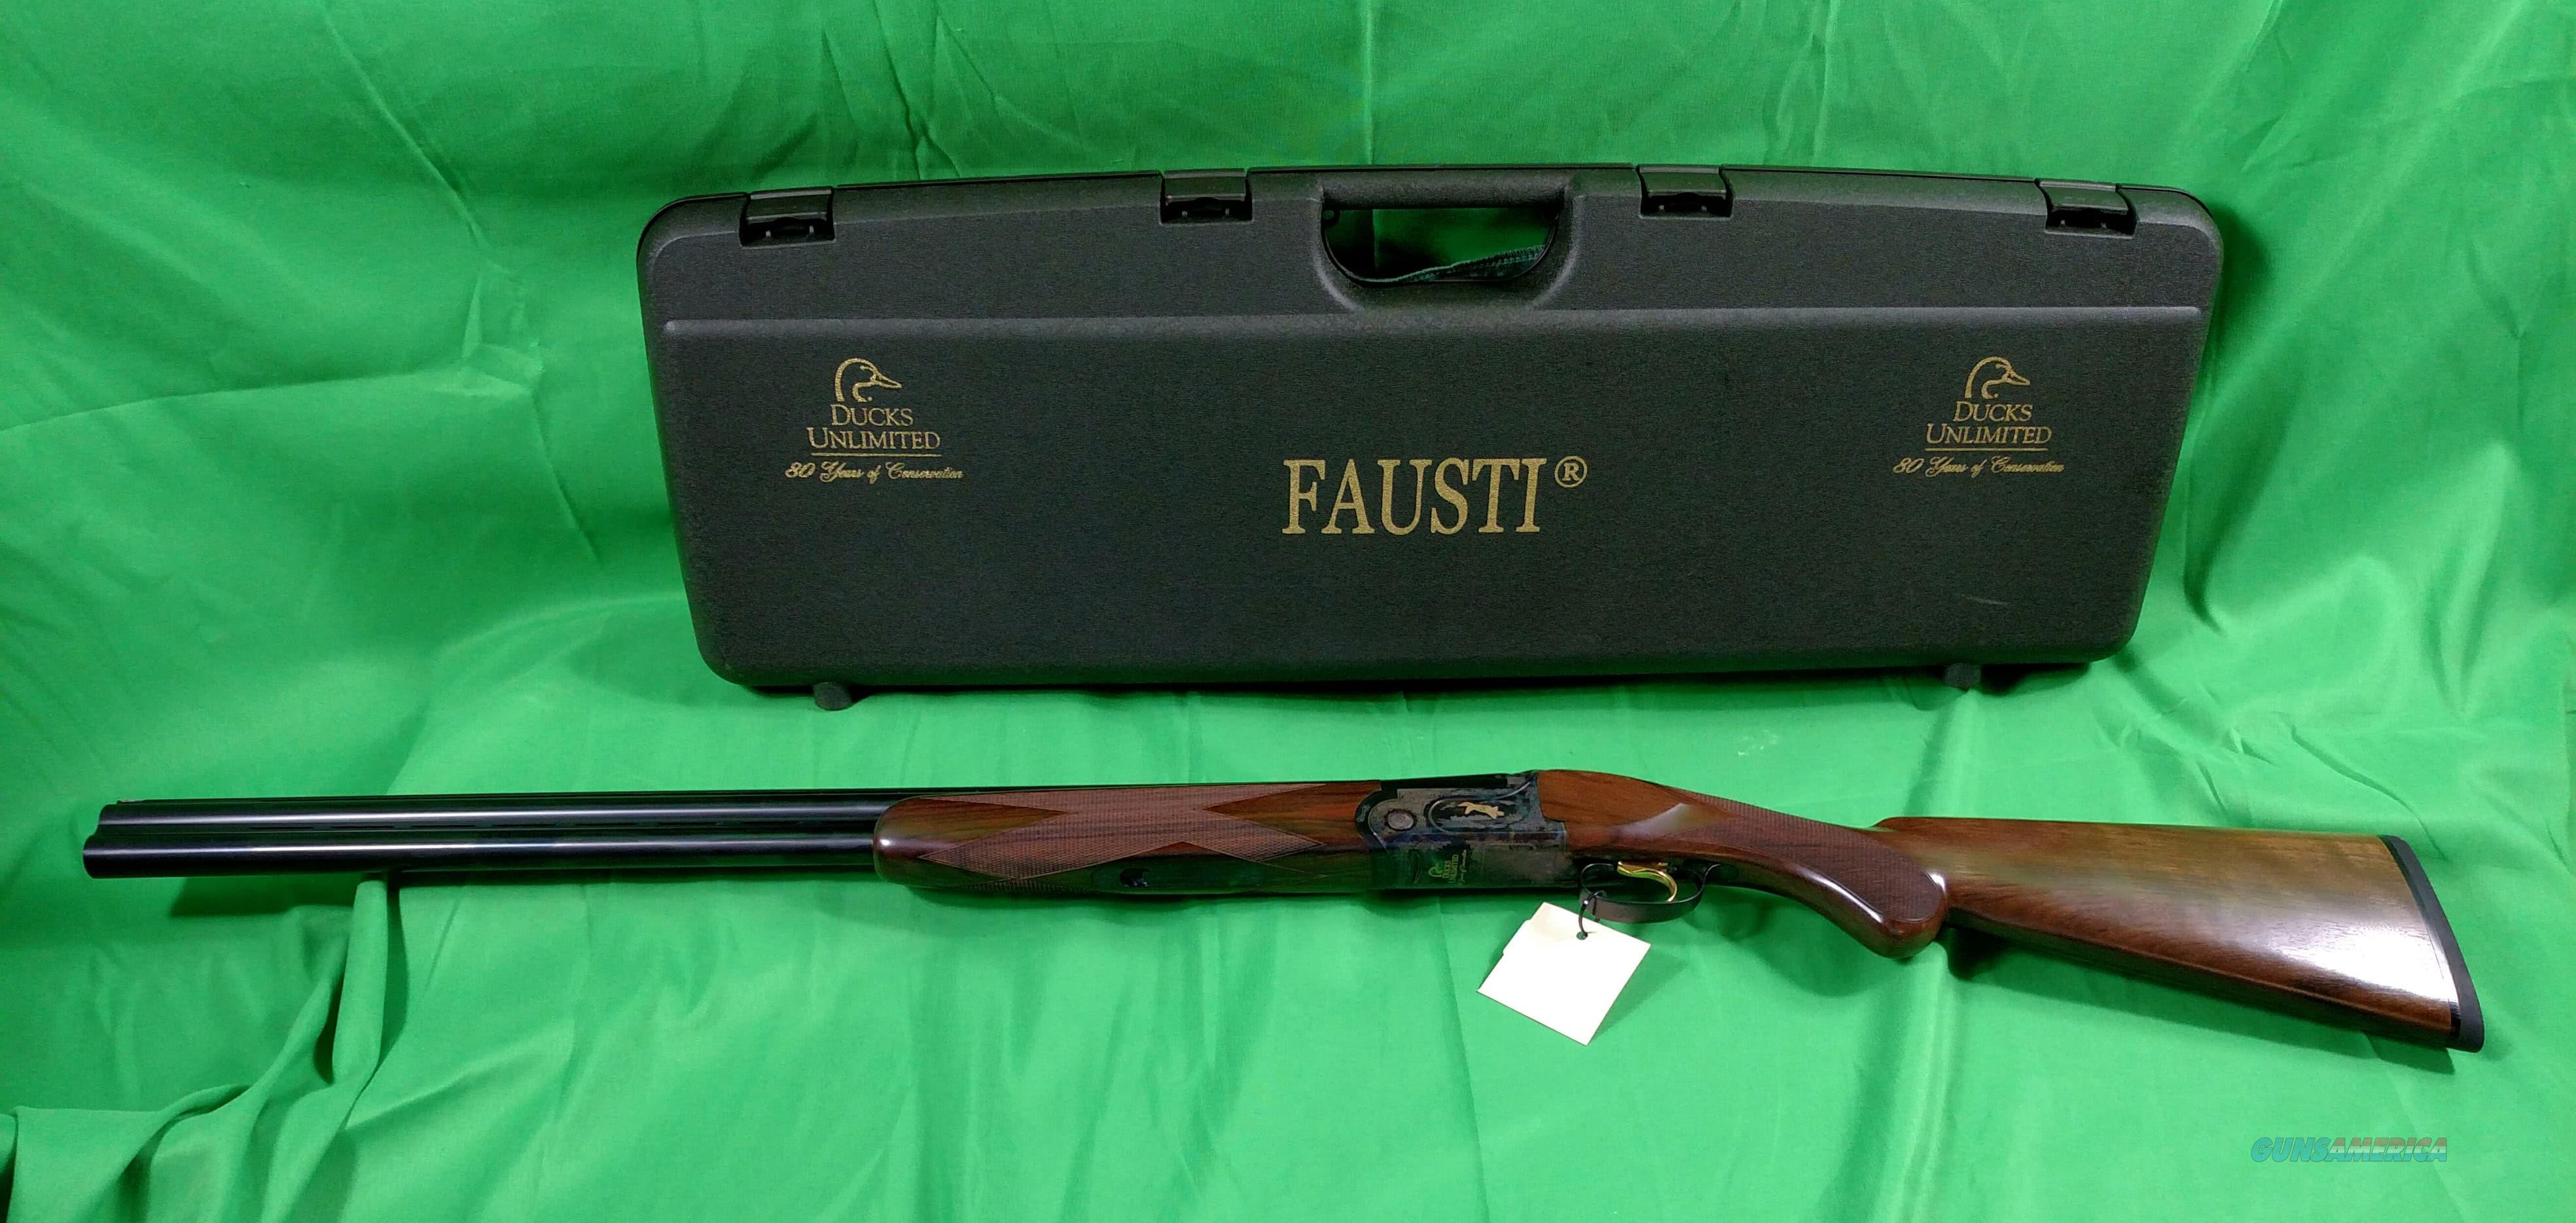 Fausti Ducks Unlimited 12 GA.   Guns > Shotguns > Fausti Shotguns